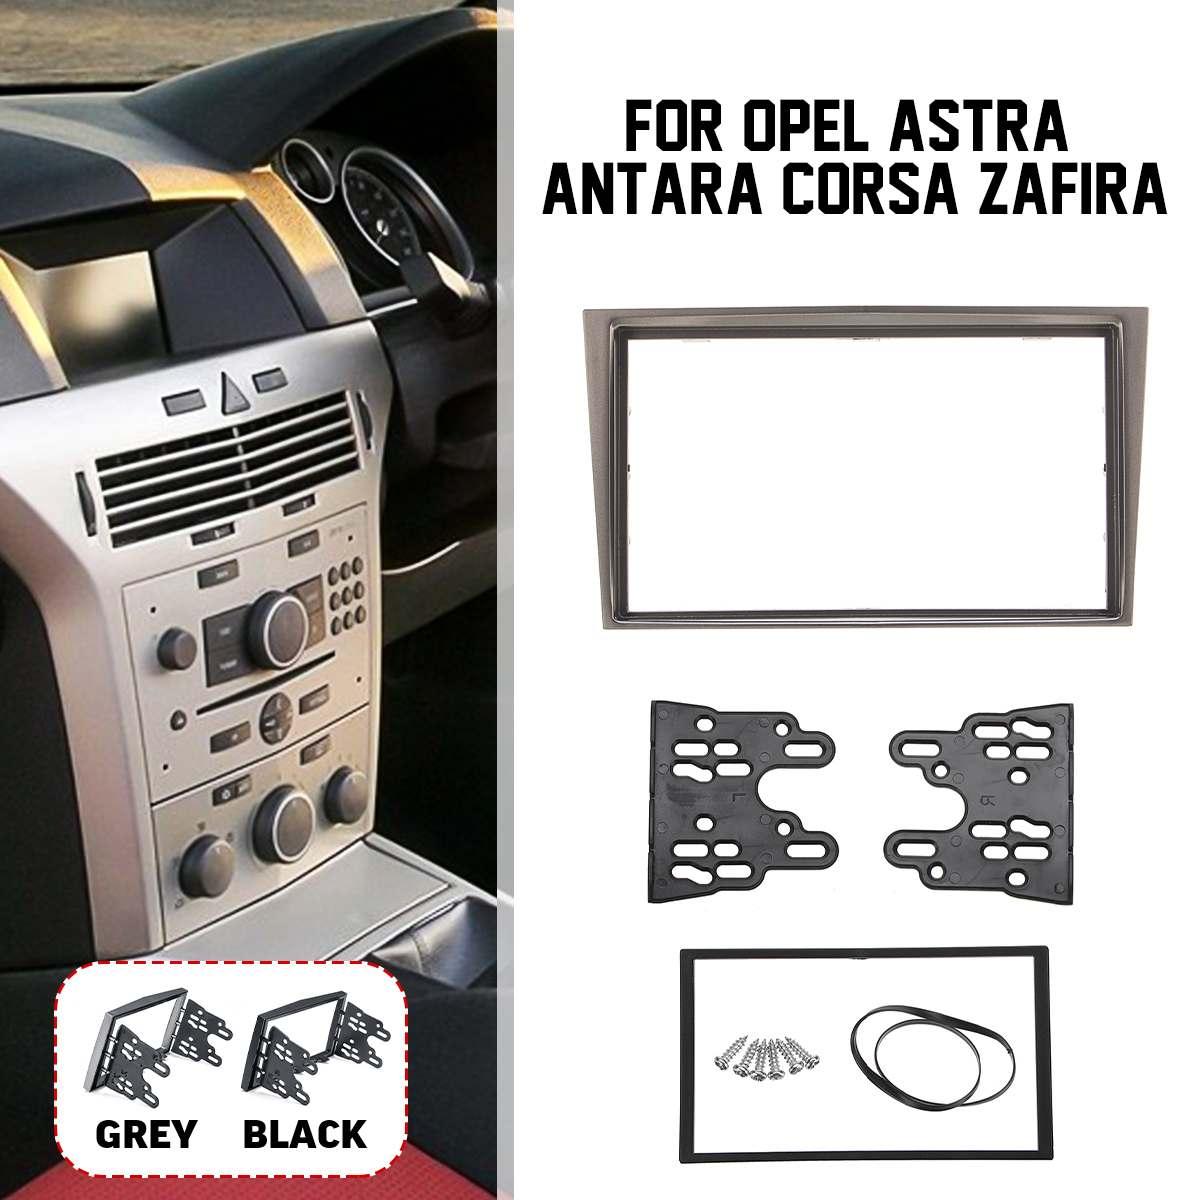 2 DIN รถวิทยุ Fascias แผงกรอบ CD DVD Dash Audio COVER Trim สำหรับ Opel Astra Antara corsa Zafira